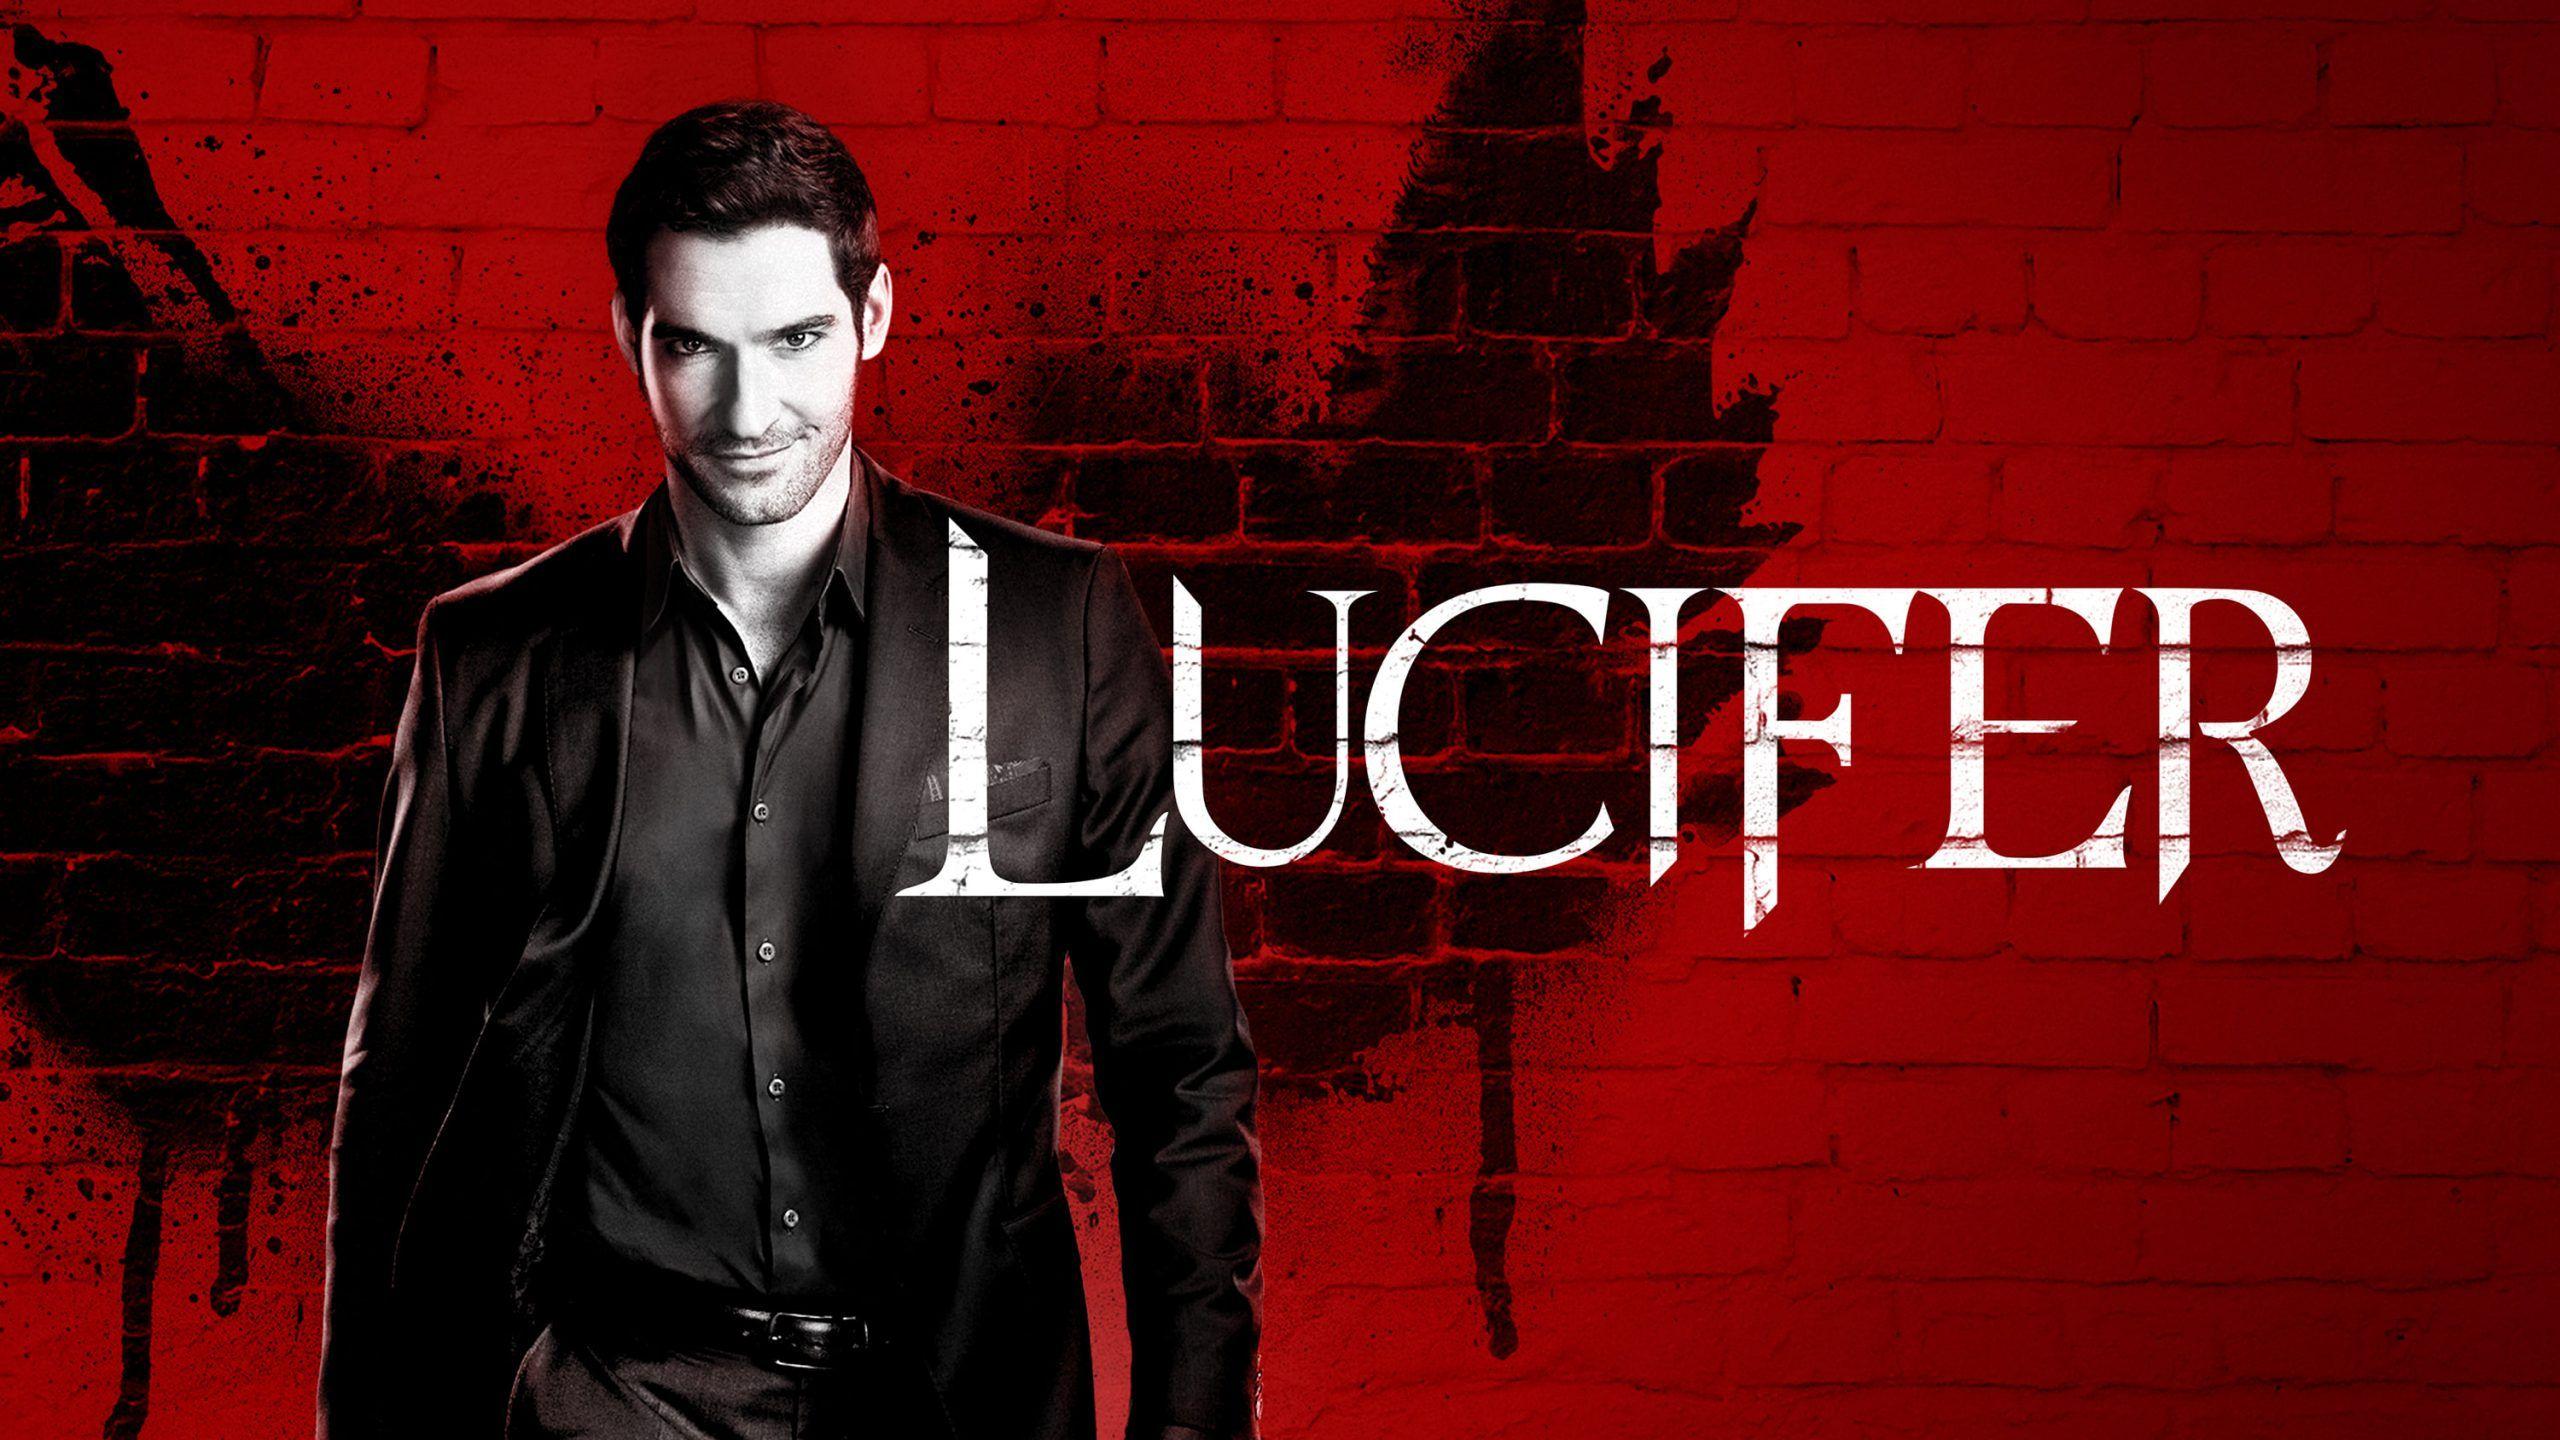 Lucifer Season 5 Wallpapers Wallpaper Cave